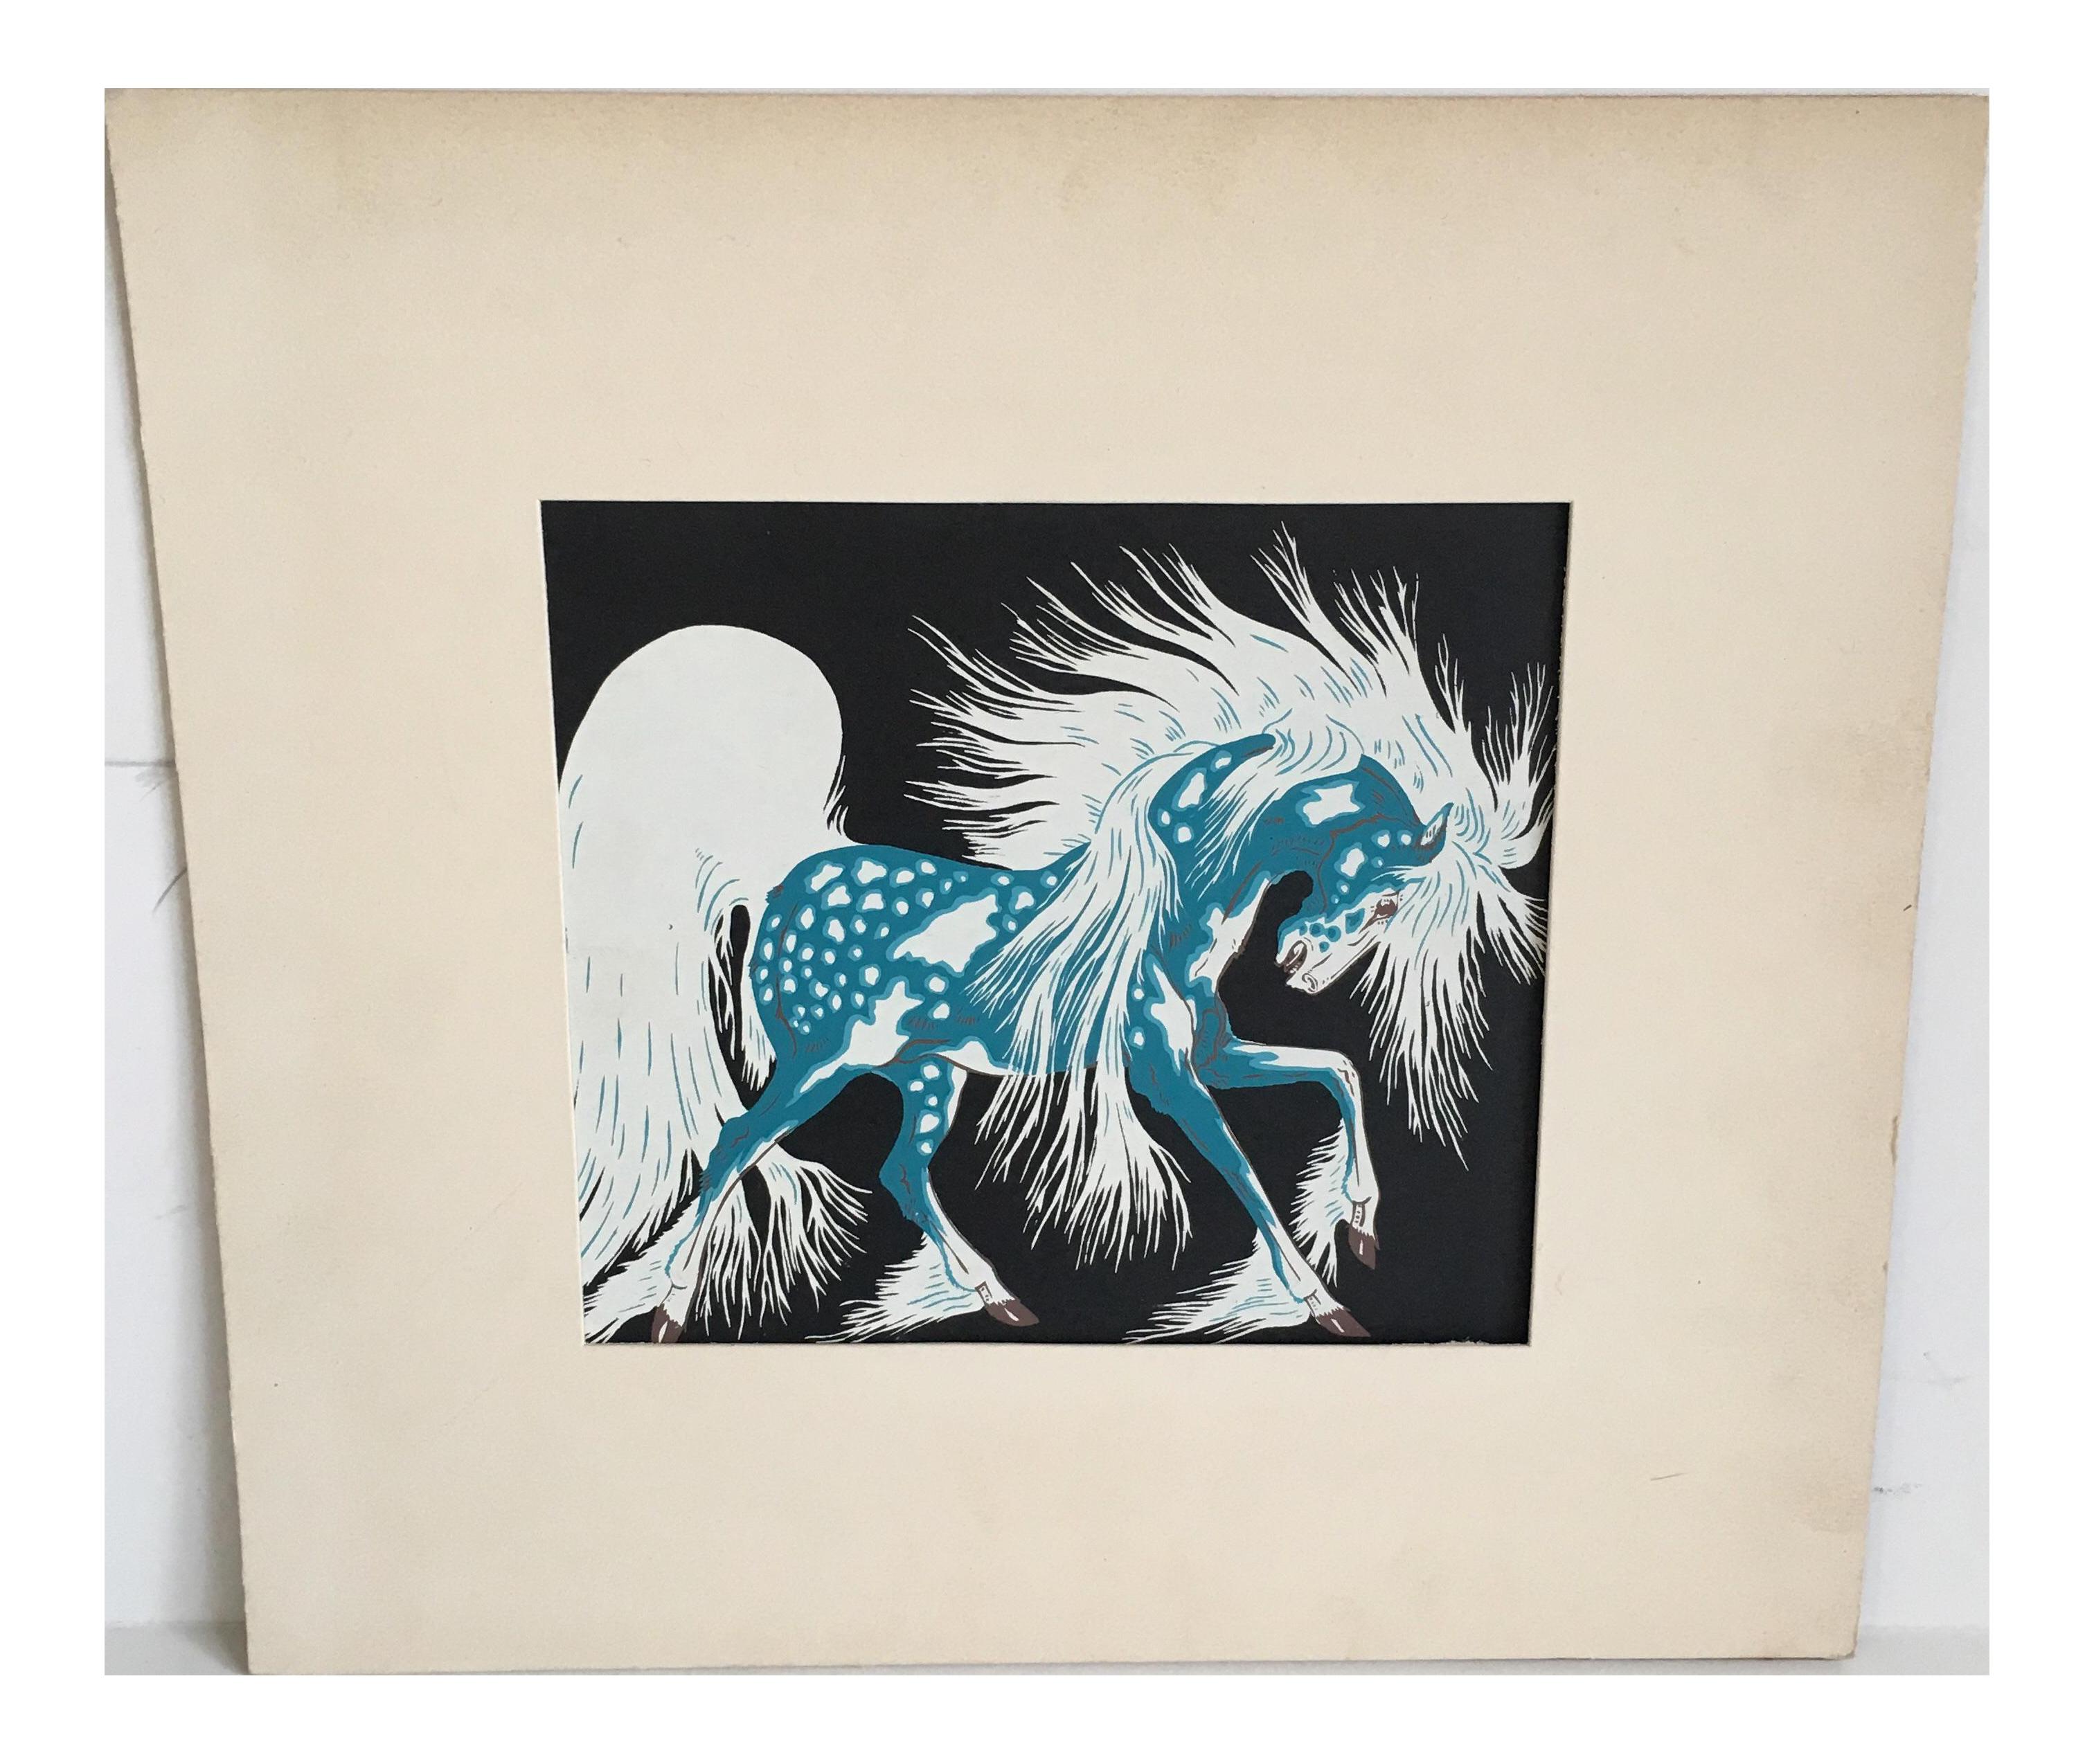 Vintage Woody Crumbo Blue Spirit Horse Serigraph | Chairish